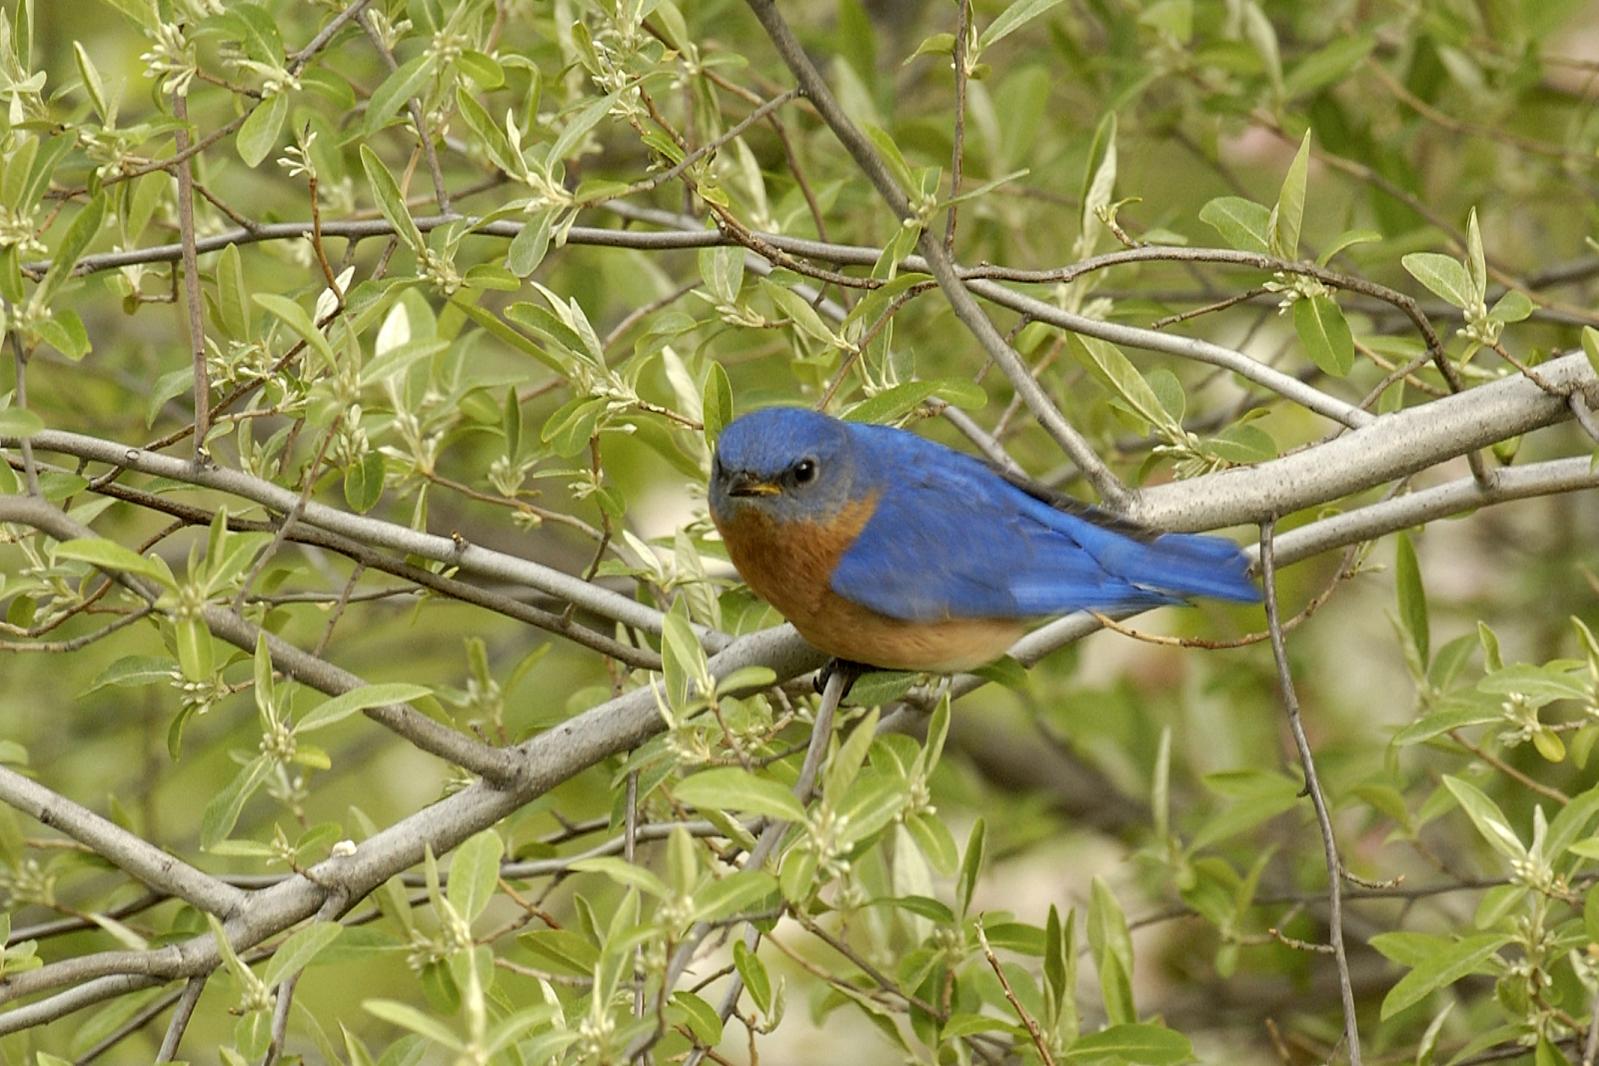 Eastern_Bluebird_1554253436381.jpg